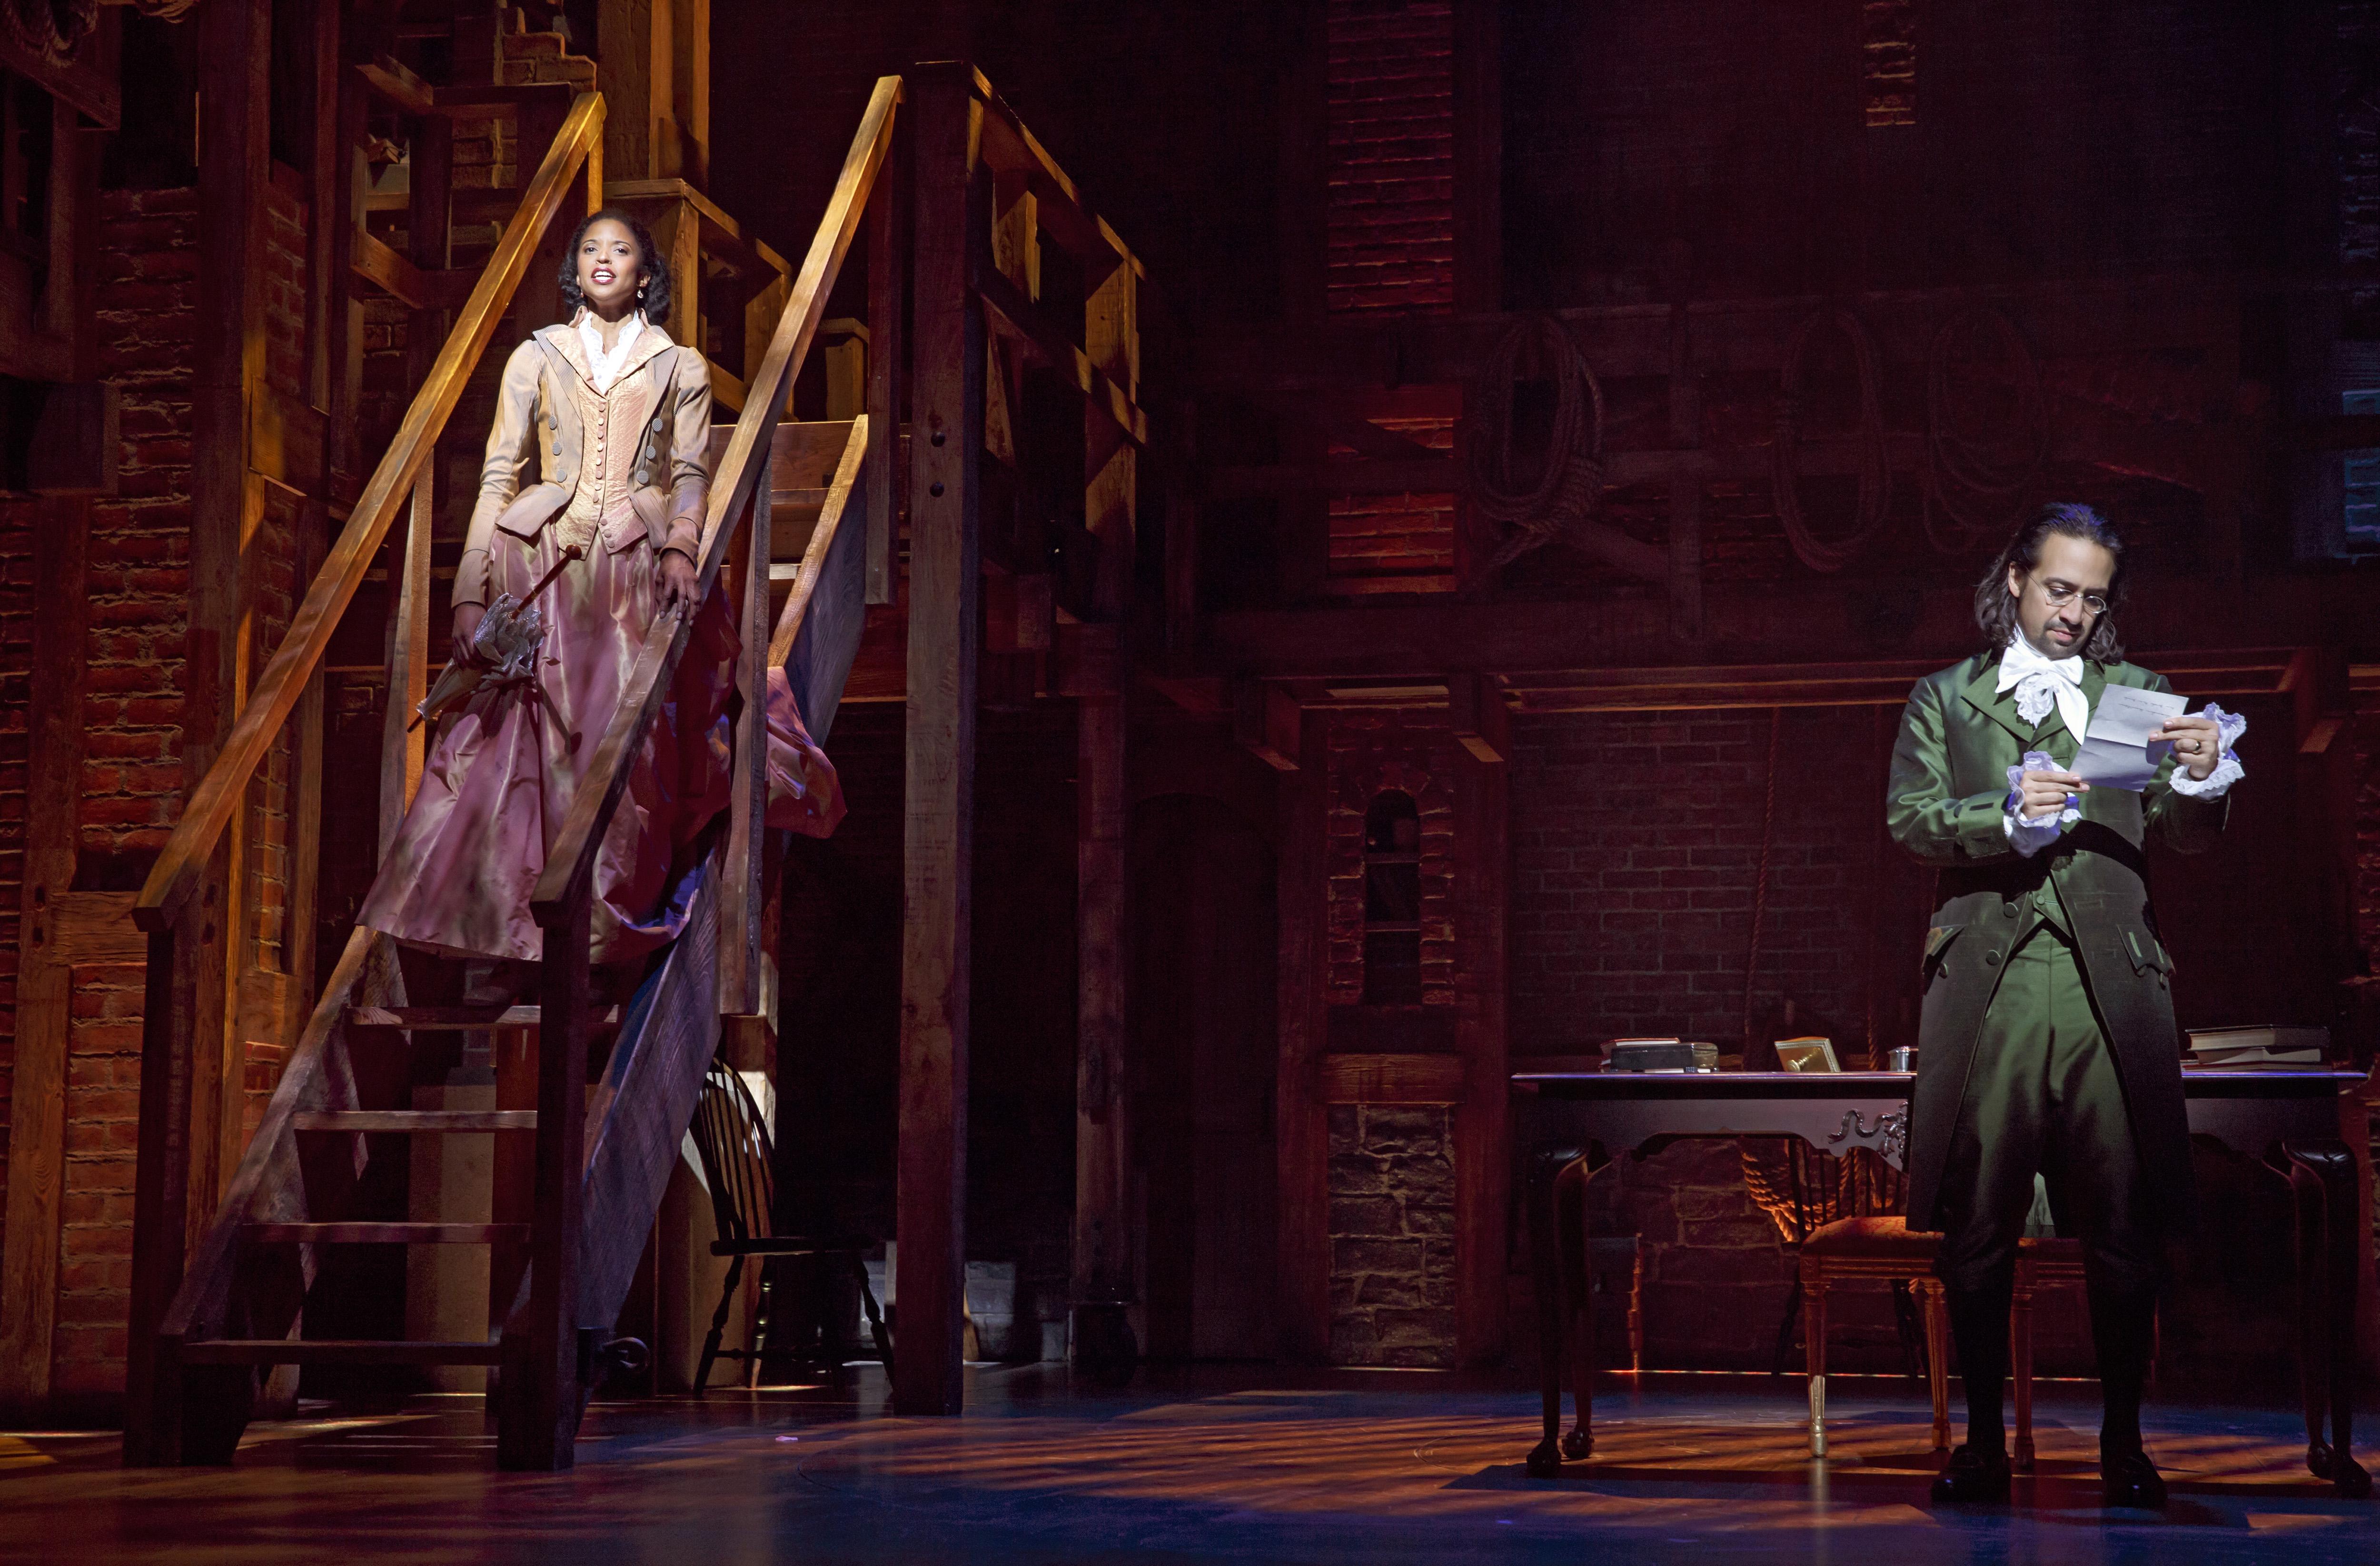 Scene from Hamilton: An American Musical